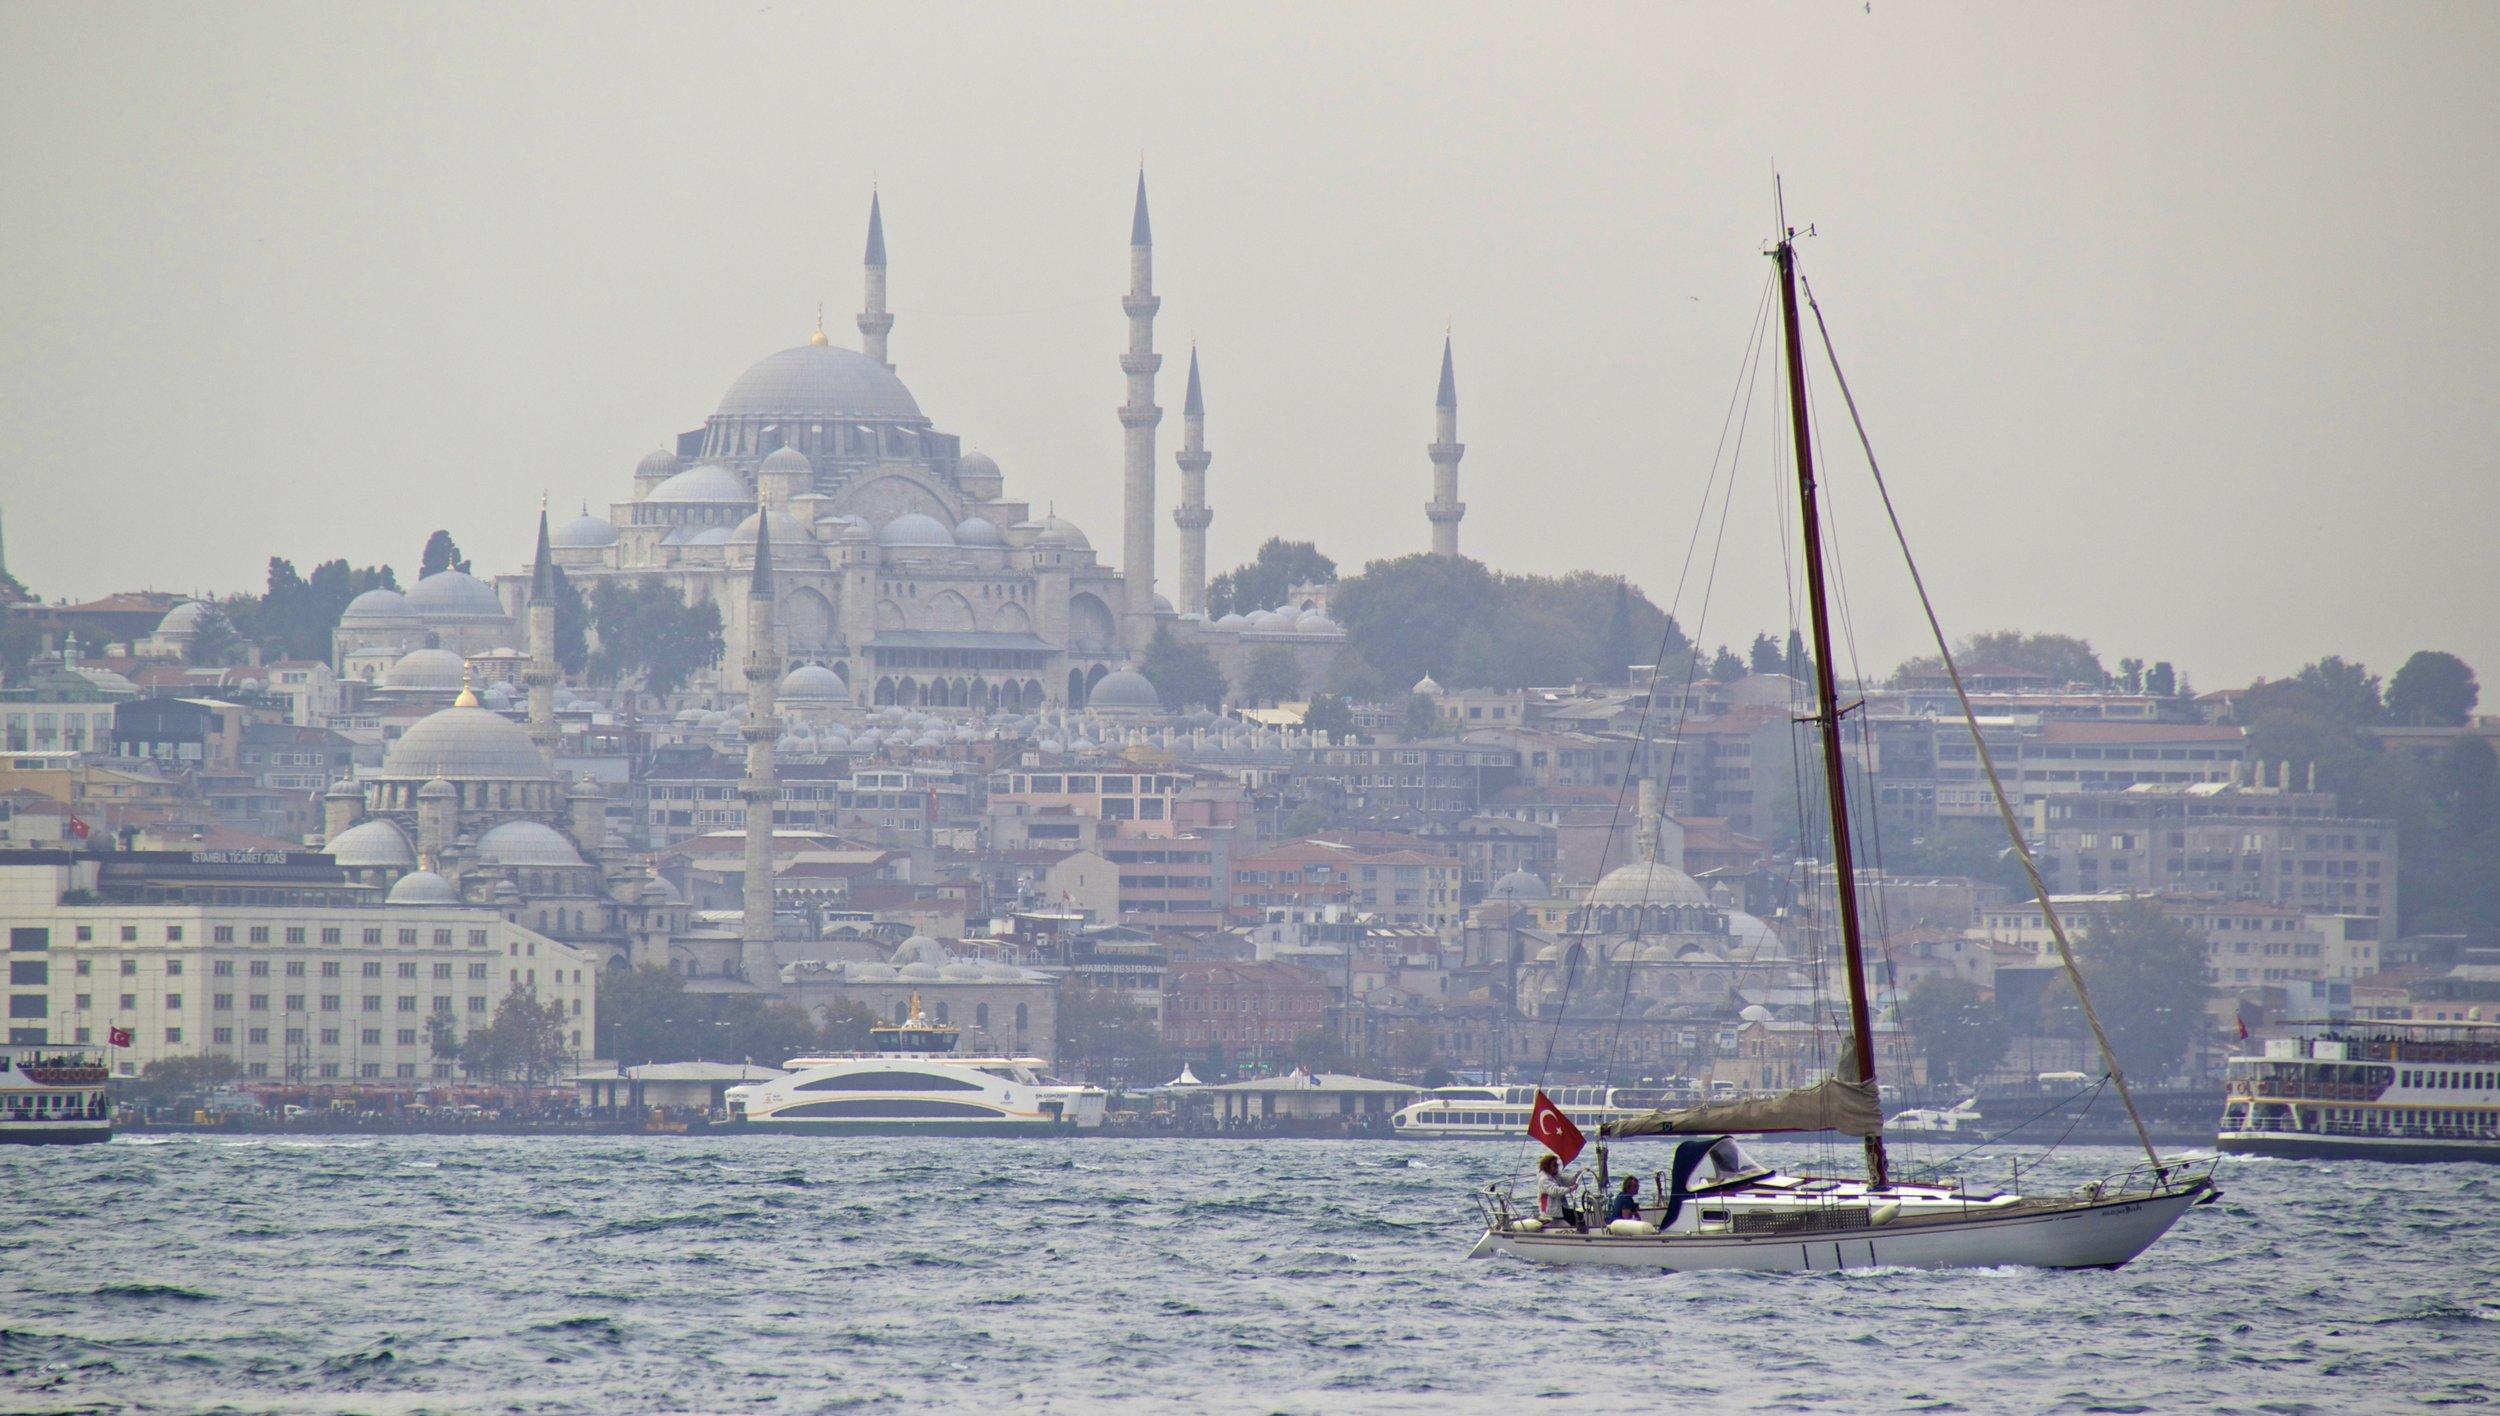 bosphorus istanbul turkey 3.jpg